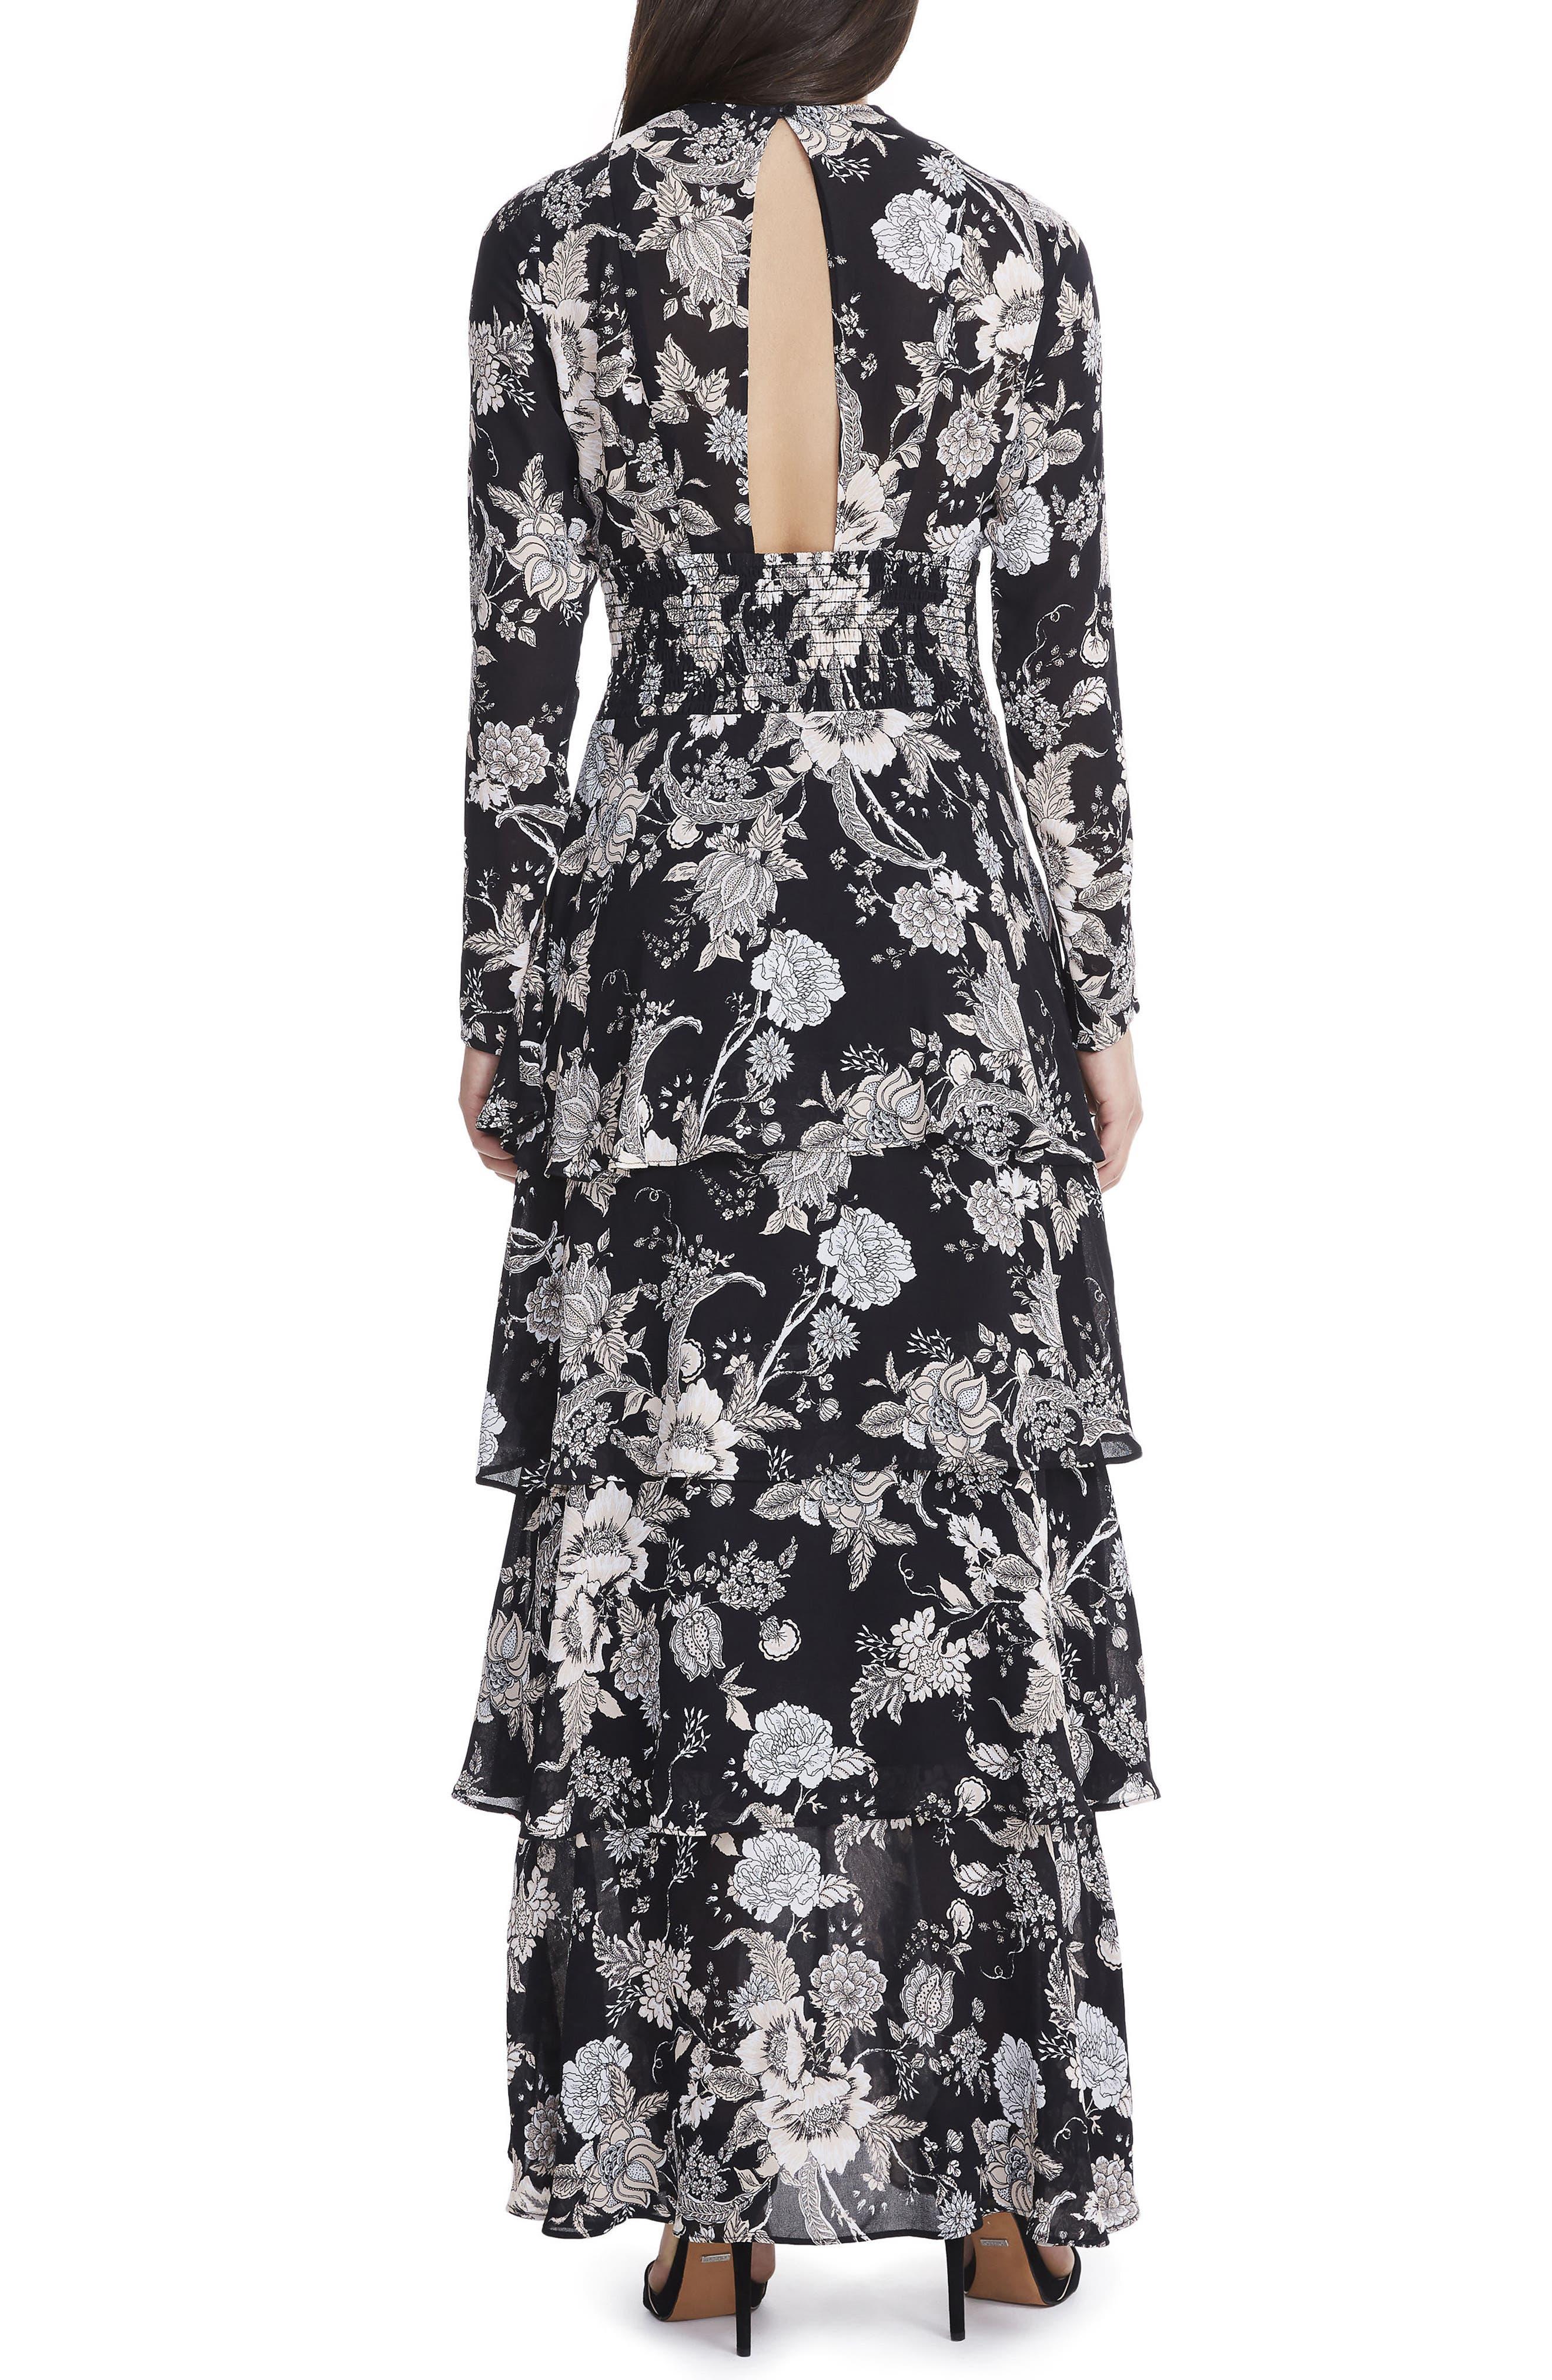 Amabella Tiered Maxi Dress,                             Alternate thumbnail 2, color,                             001